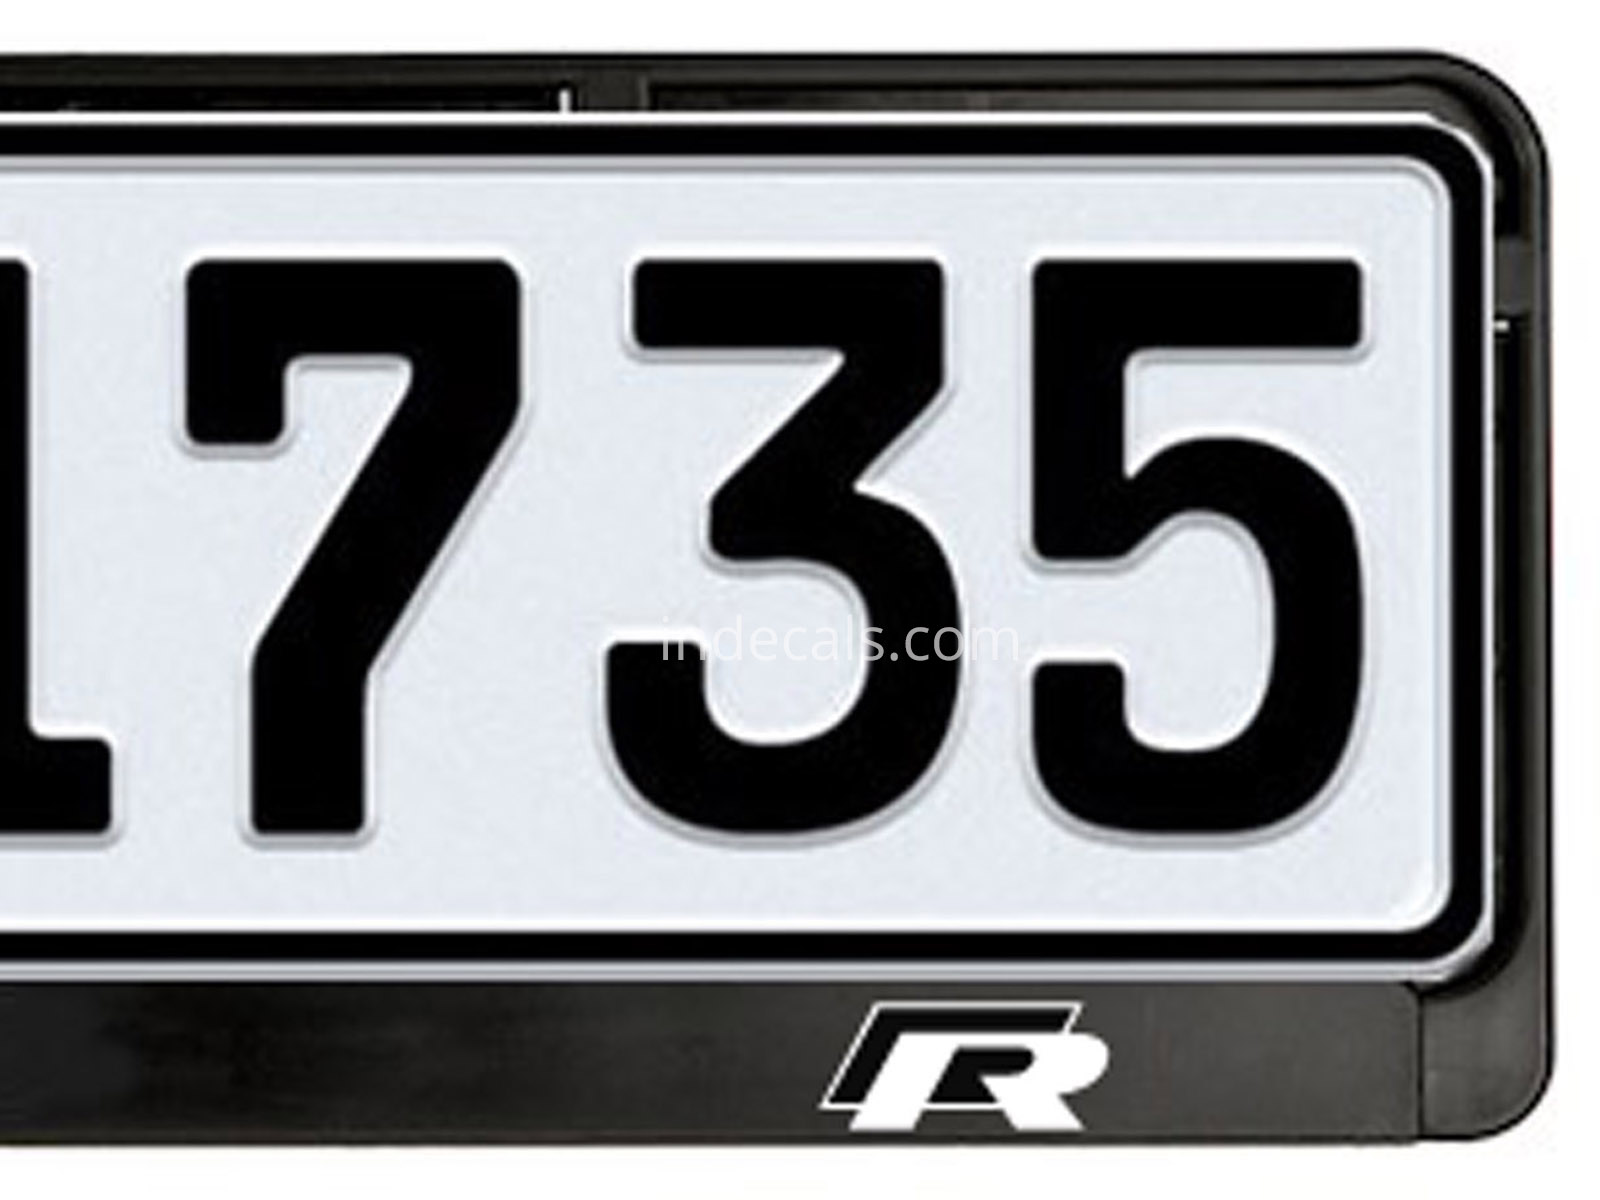 2 x Volkswagen R-Line stickers for License Plate Frame - indecals.com